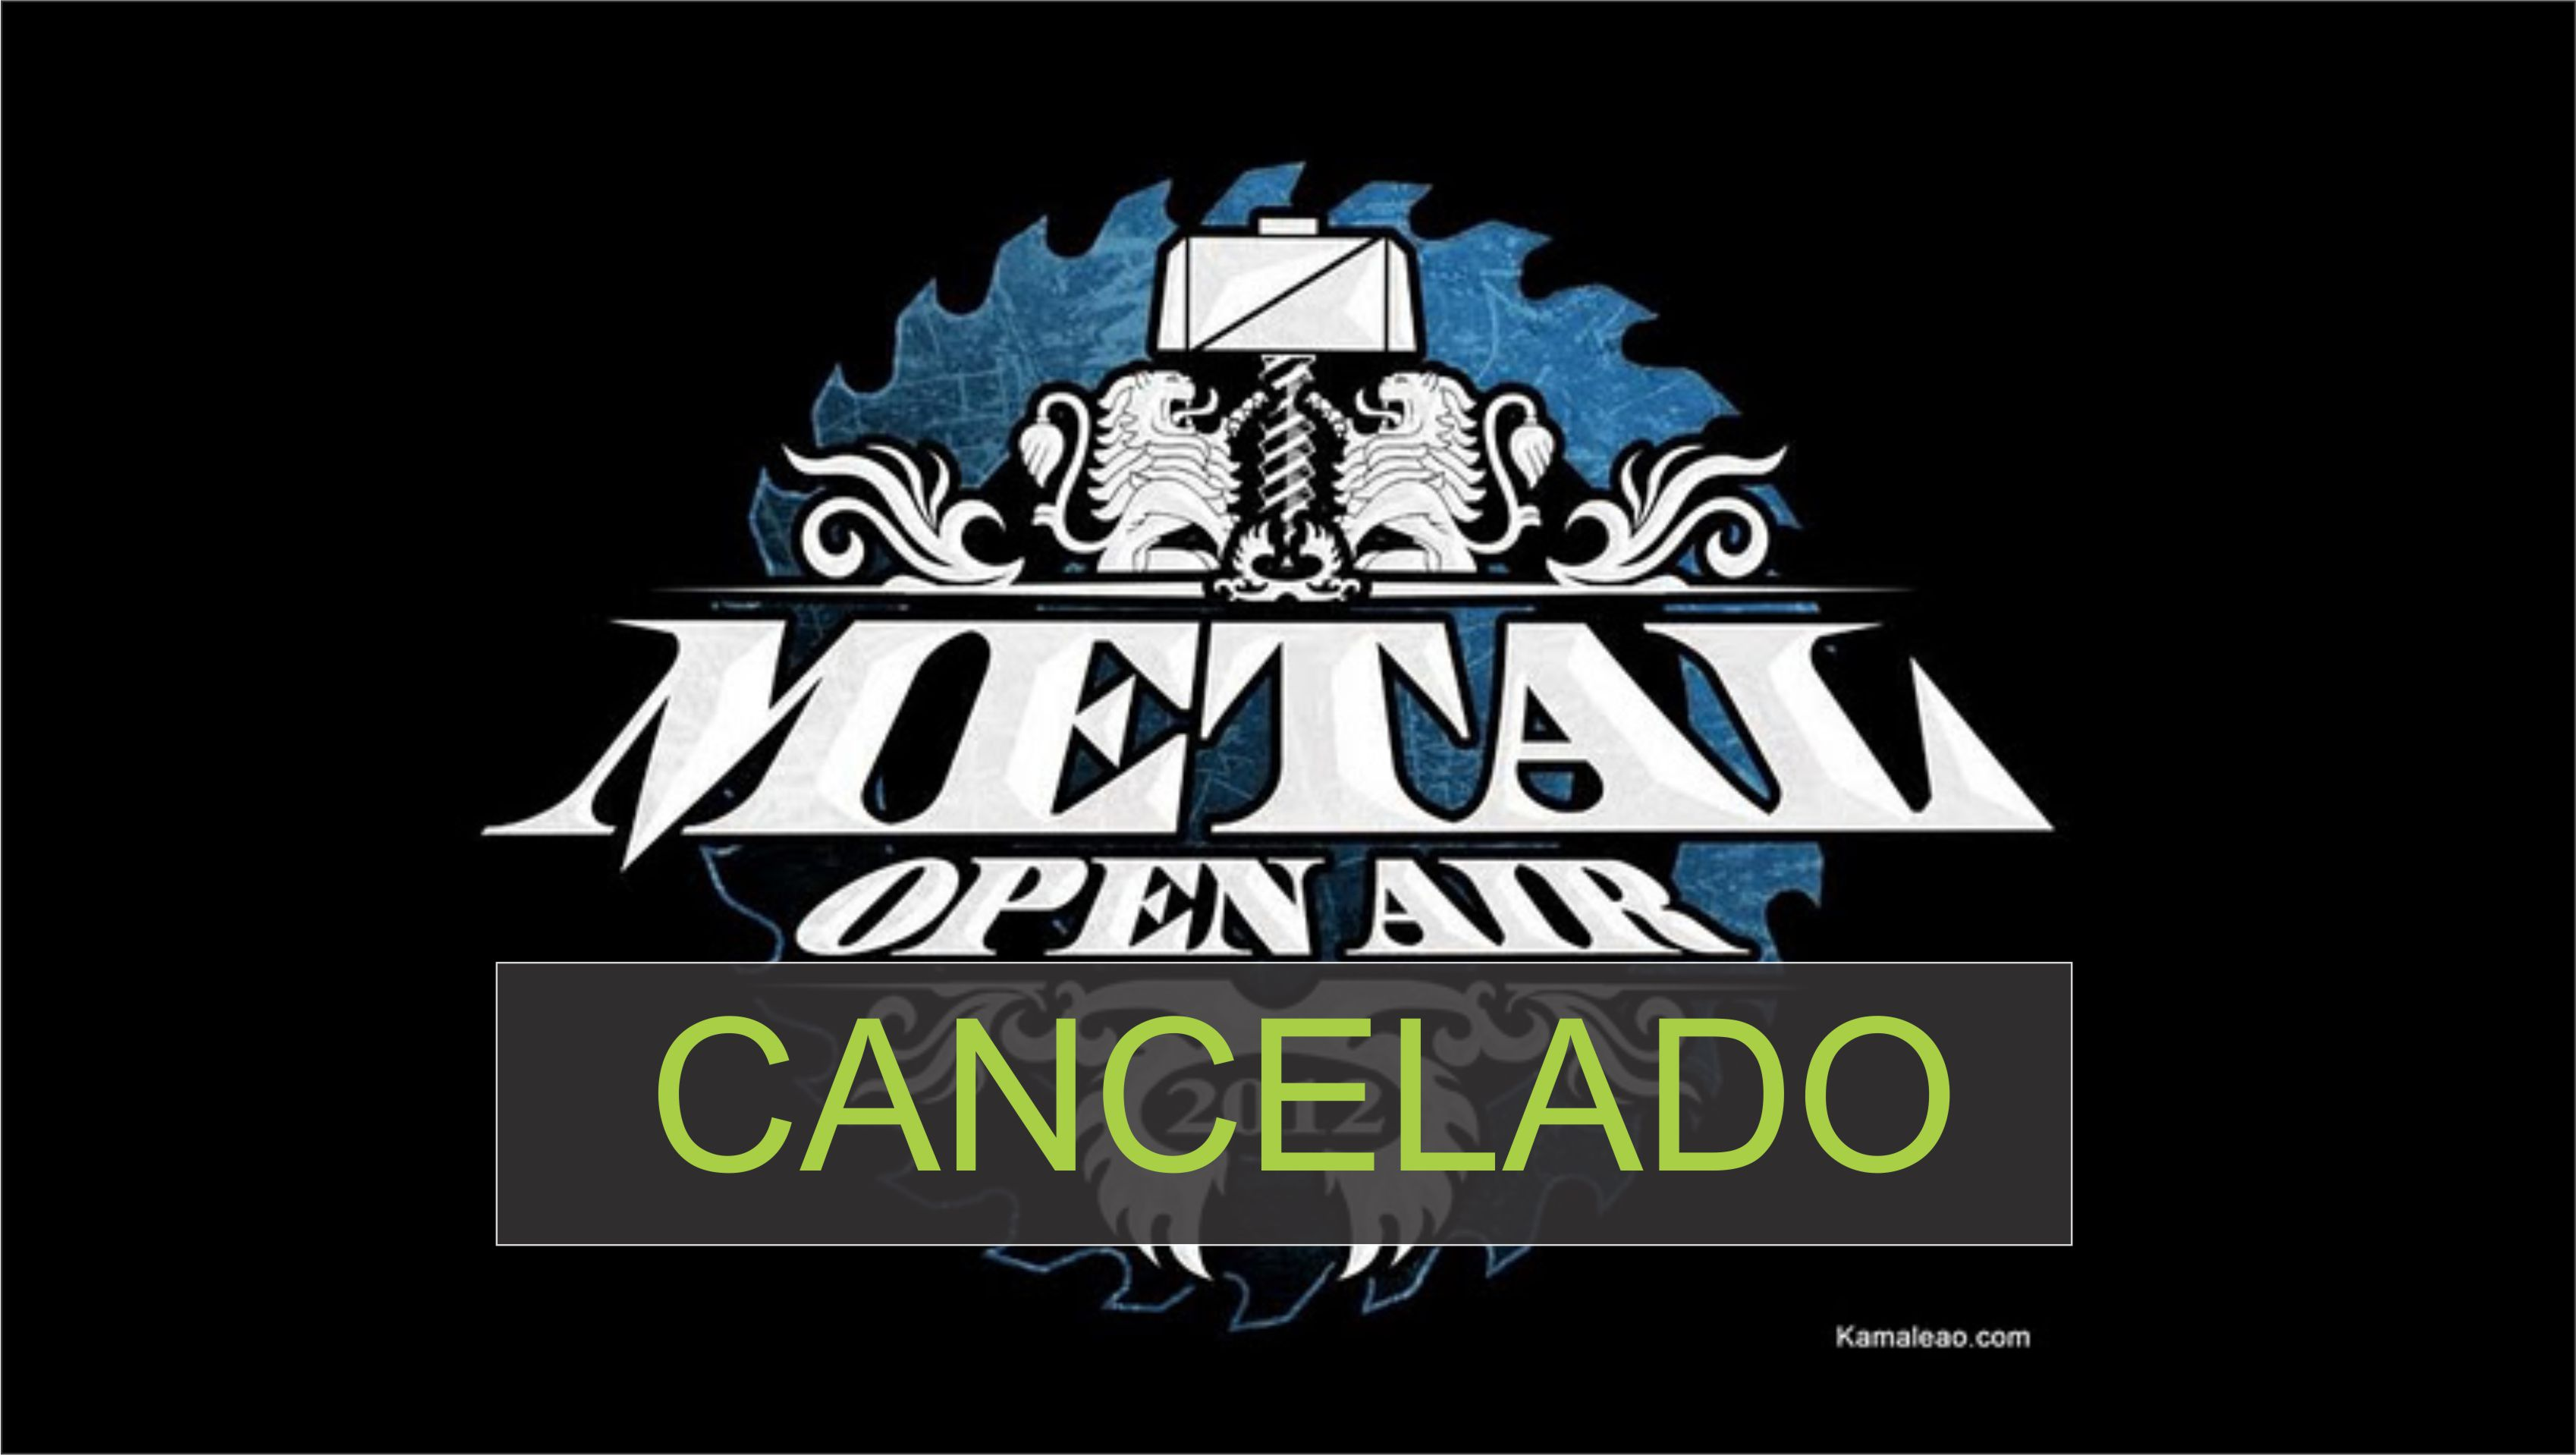 Metal Open Air